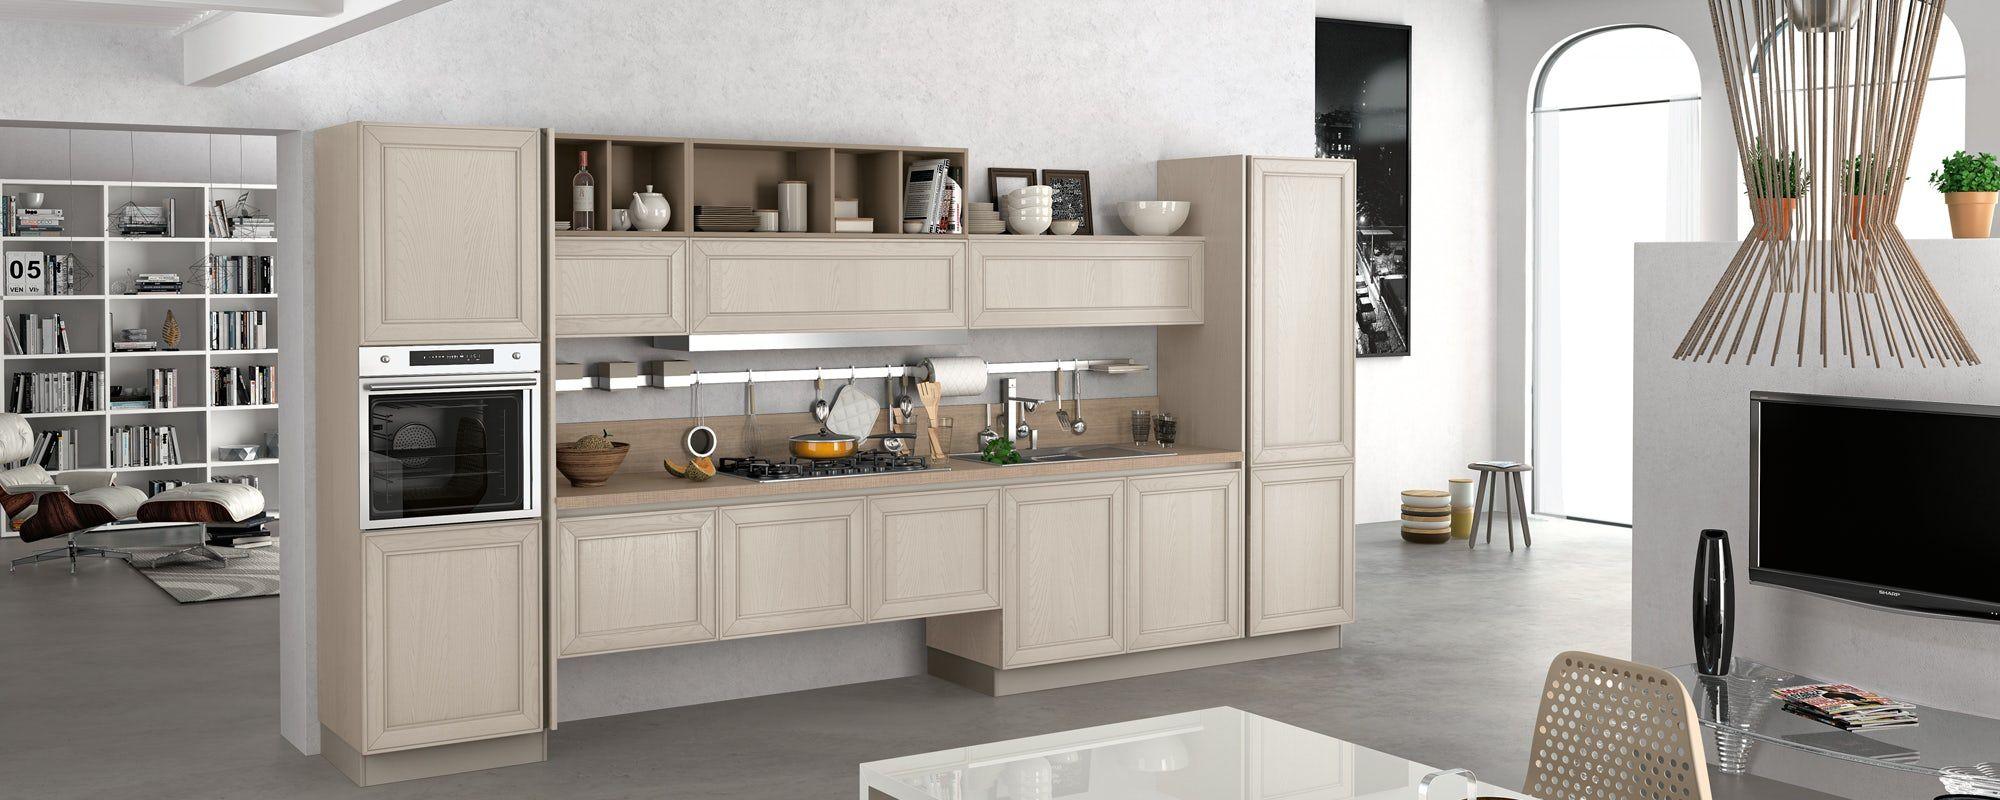 cucine contemporanee stosa - modello cucina maxim 07 | cucina ...